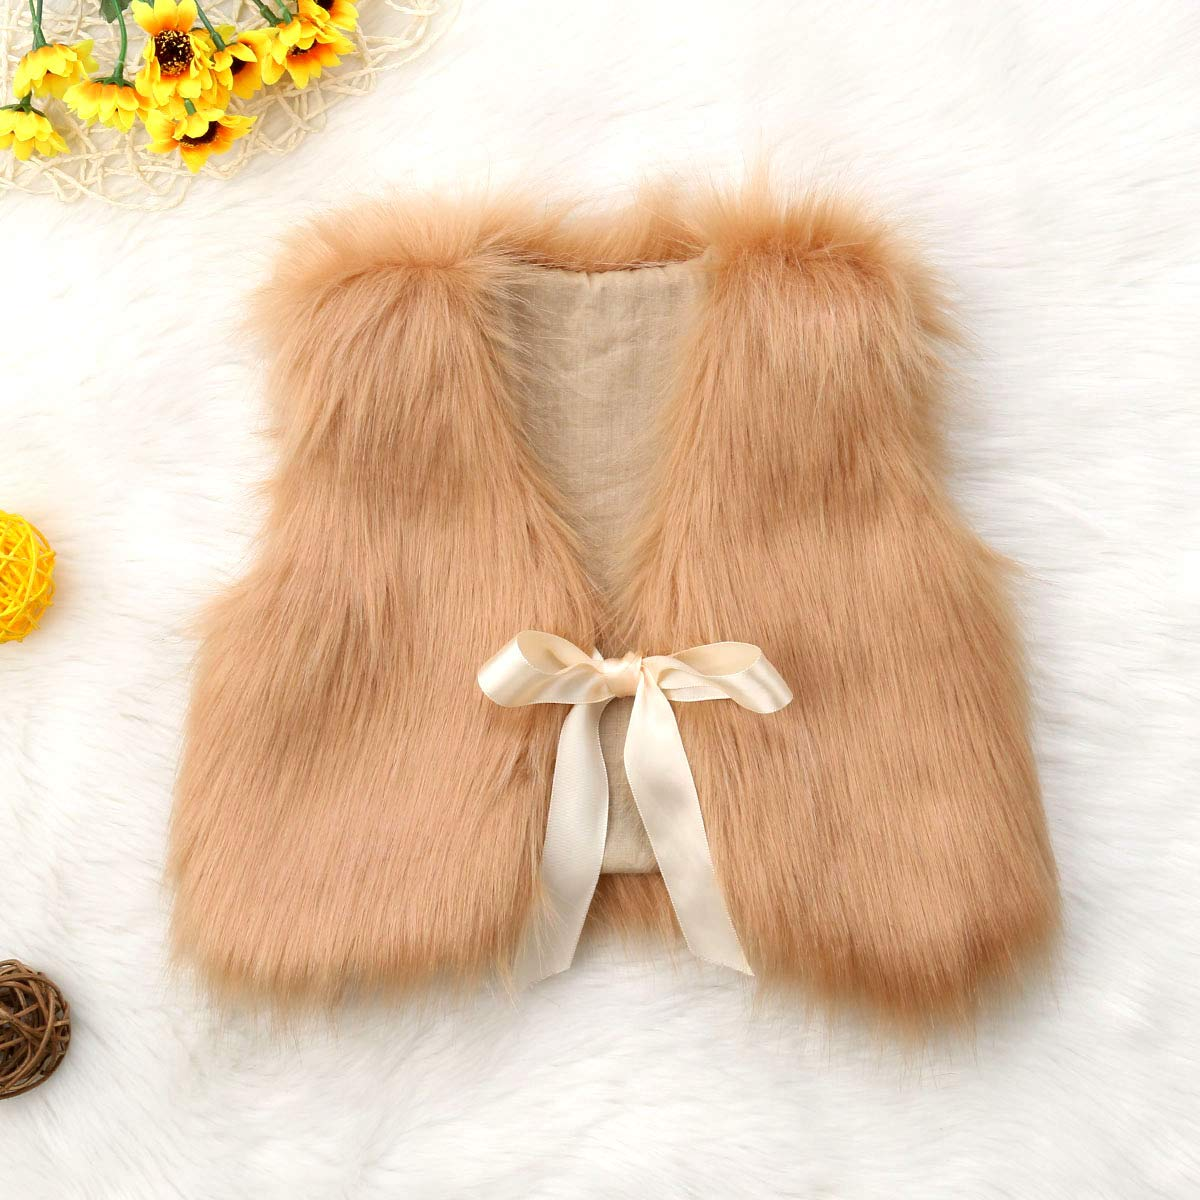 XBRECO Toddler Girl Faux Fur Vest Coat Winter Warm Waistcoat Outerwear